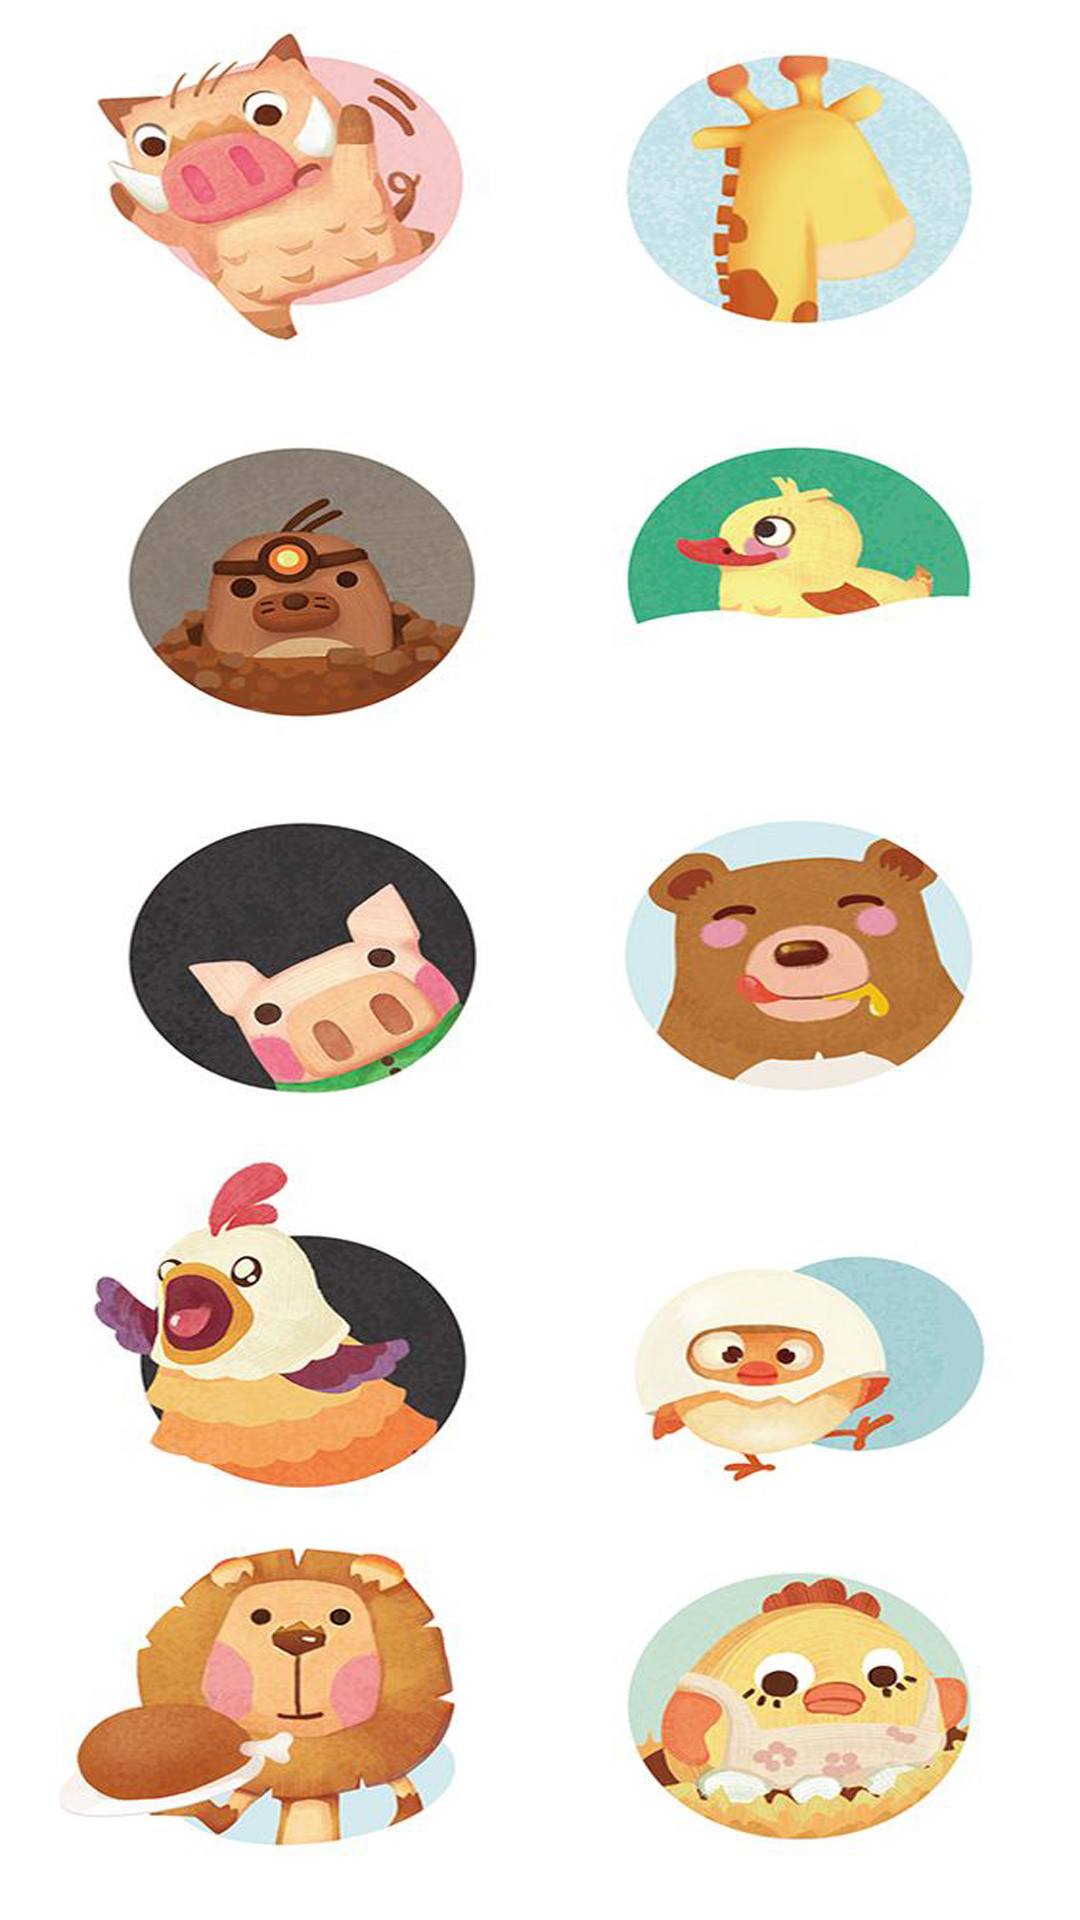 1280x2272 DD 1 4 D 3 NNEURDuNNOE Cute Wallpapers For Iphone 5s